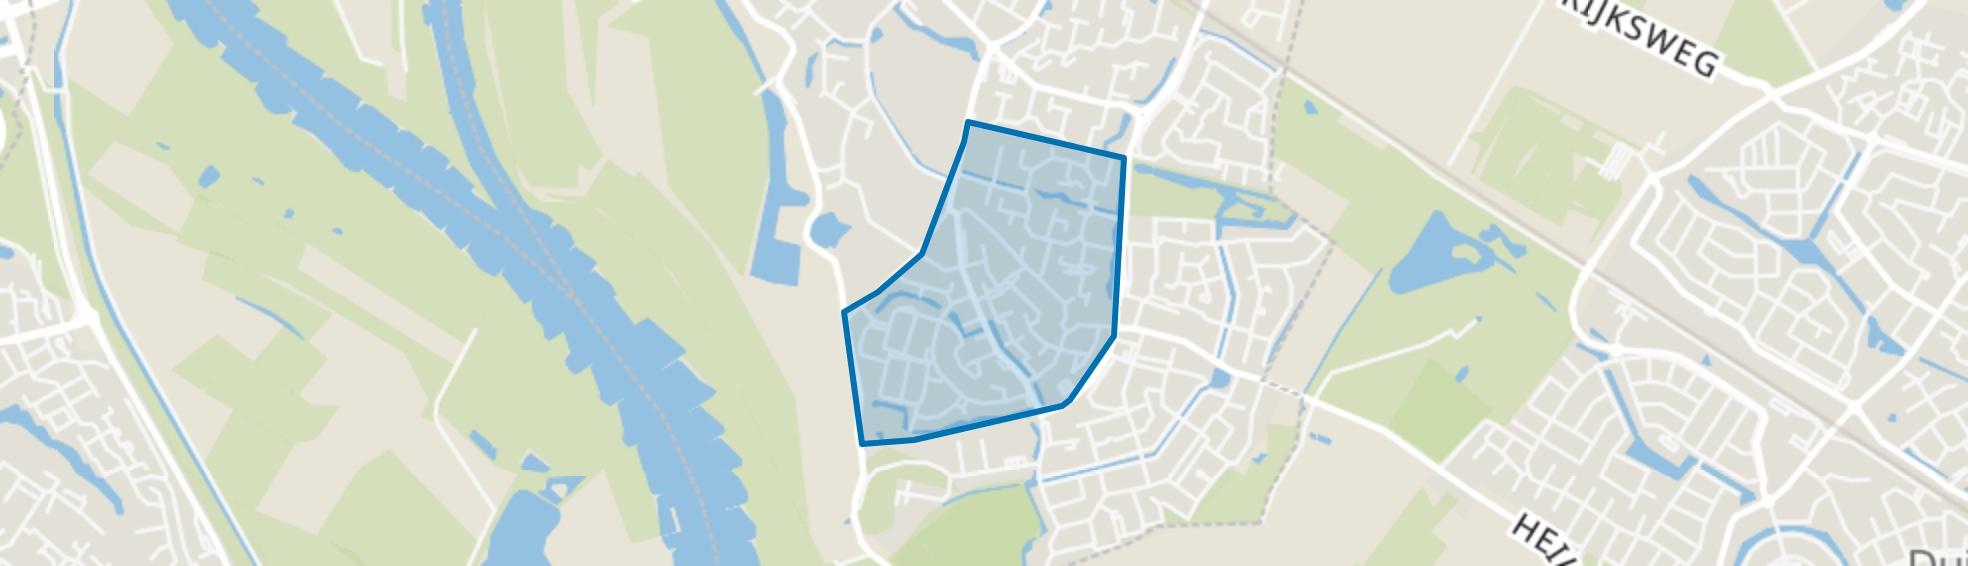 Westervoort-Lange Maat en Hoogeind, Westervoort map